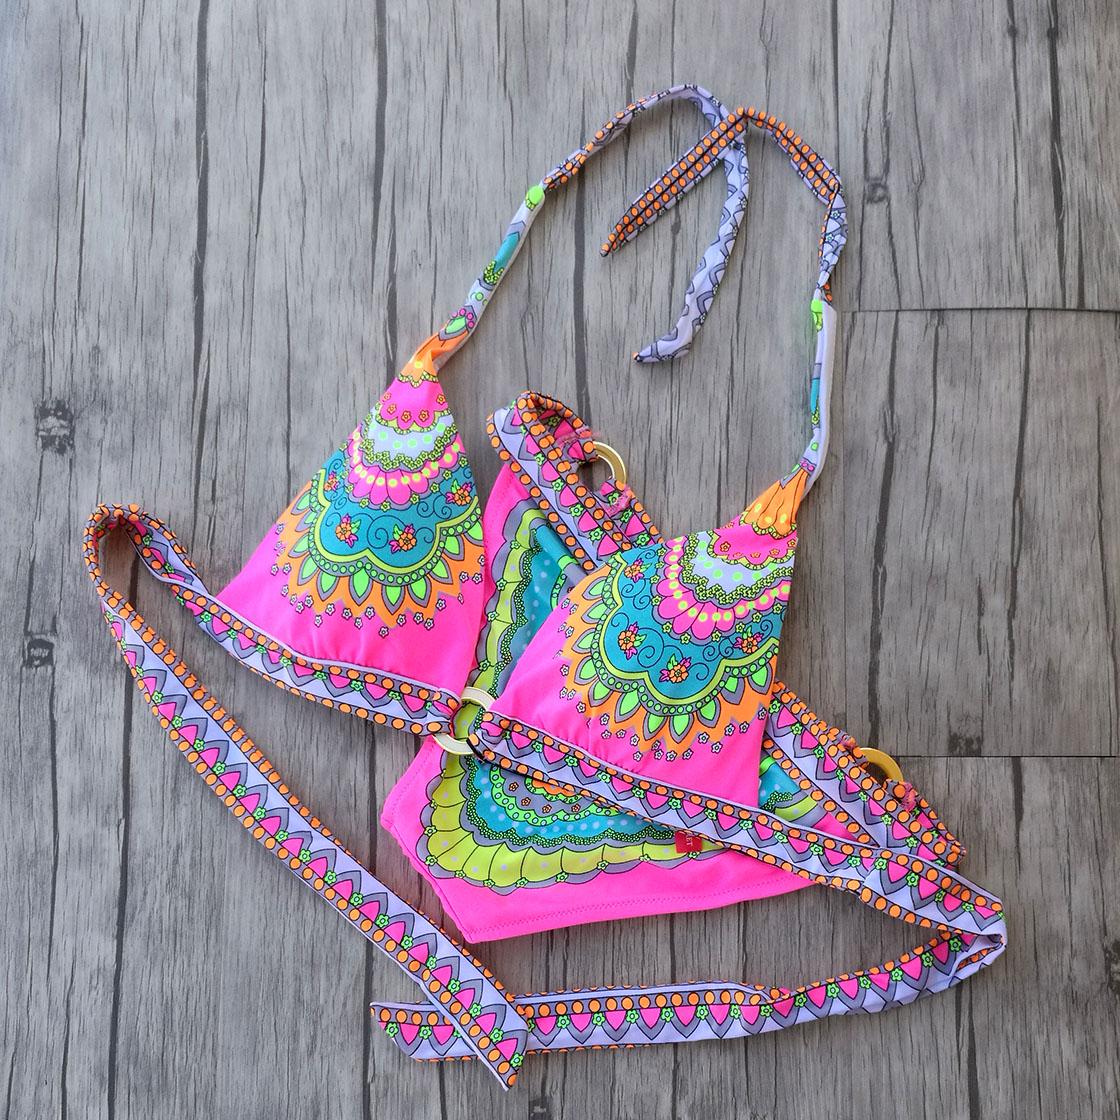 Triangle Bikini Pink Floral print Swimwear Women  Thick Small Chest Swimsuit Girl Design Secret Sexy Bikinis